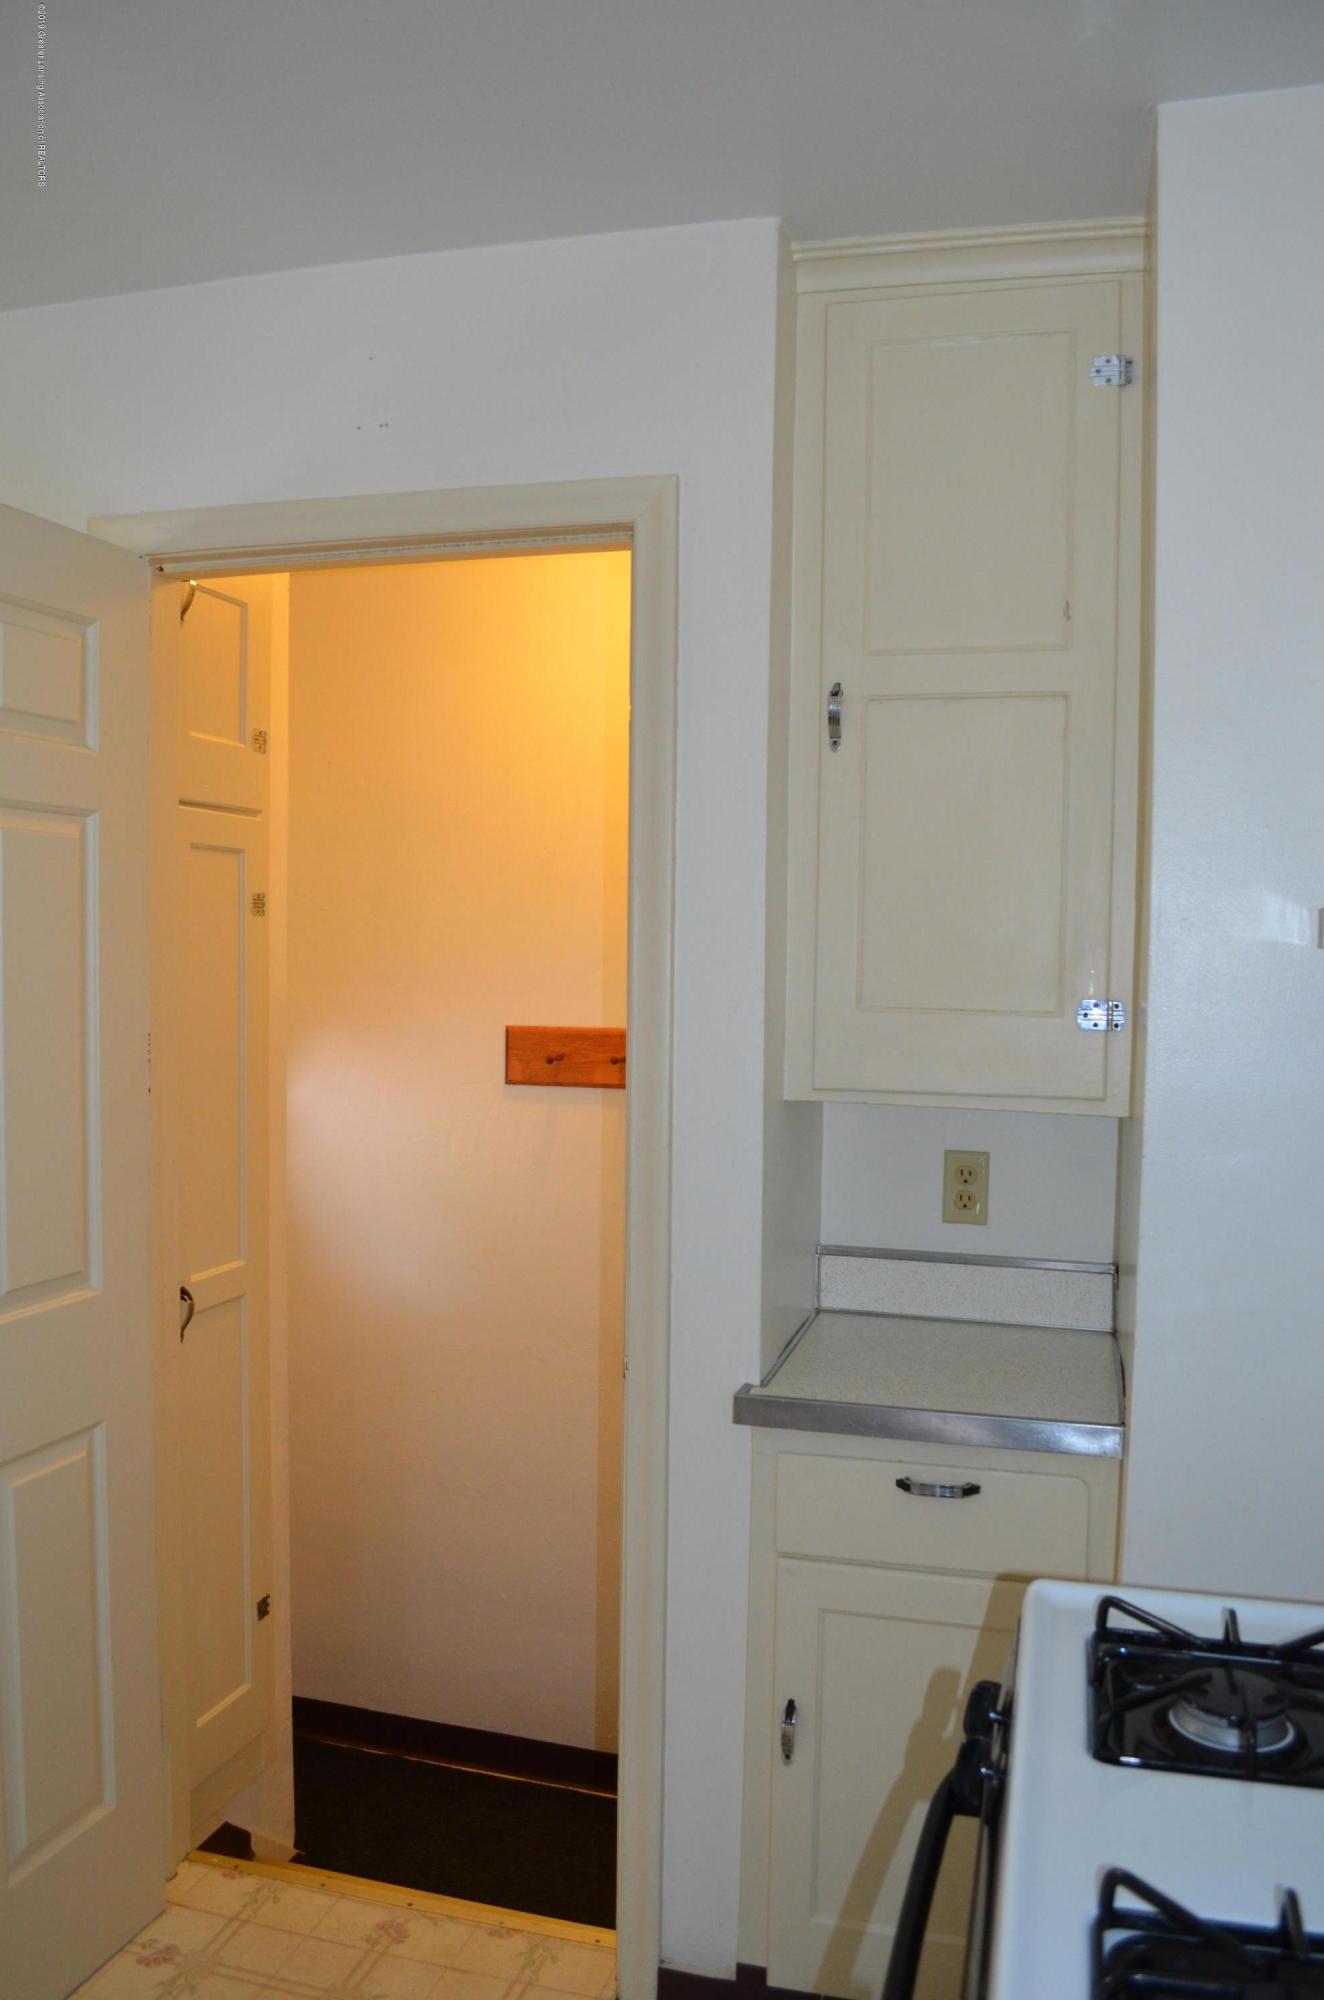 1200 W Rundle Ave - Broom Closet - 20